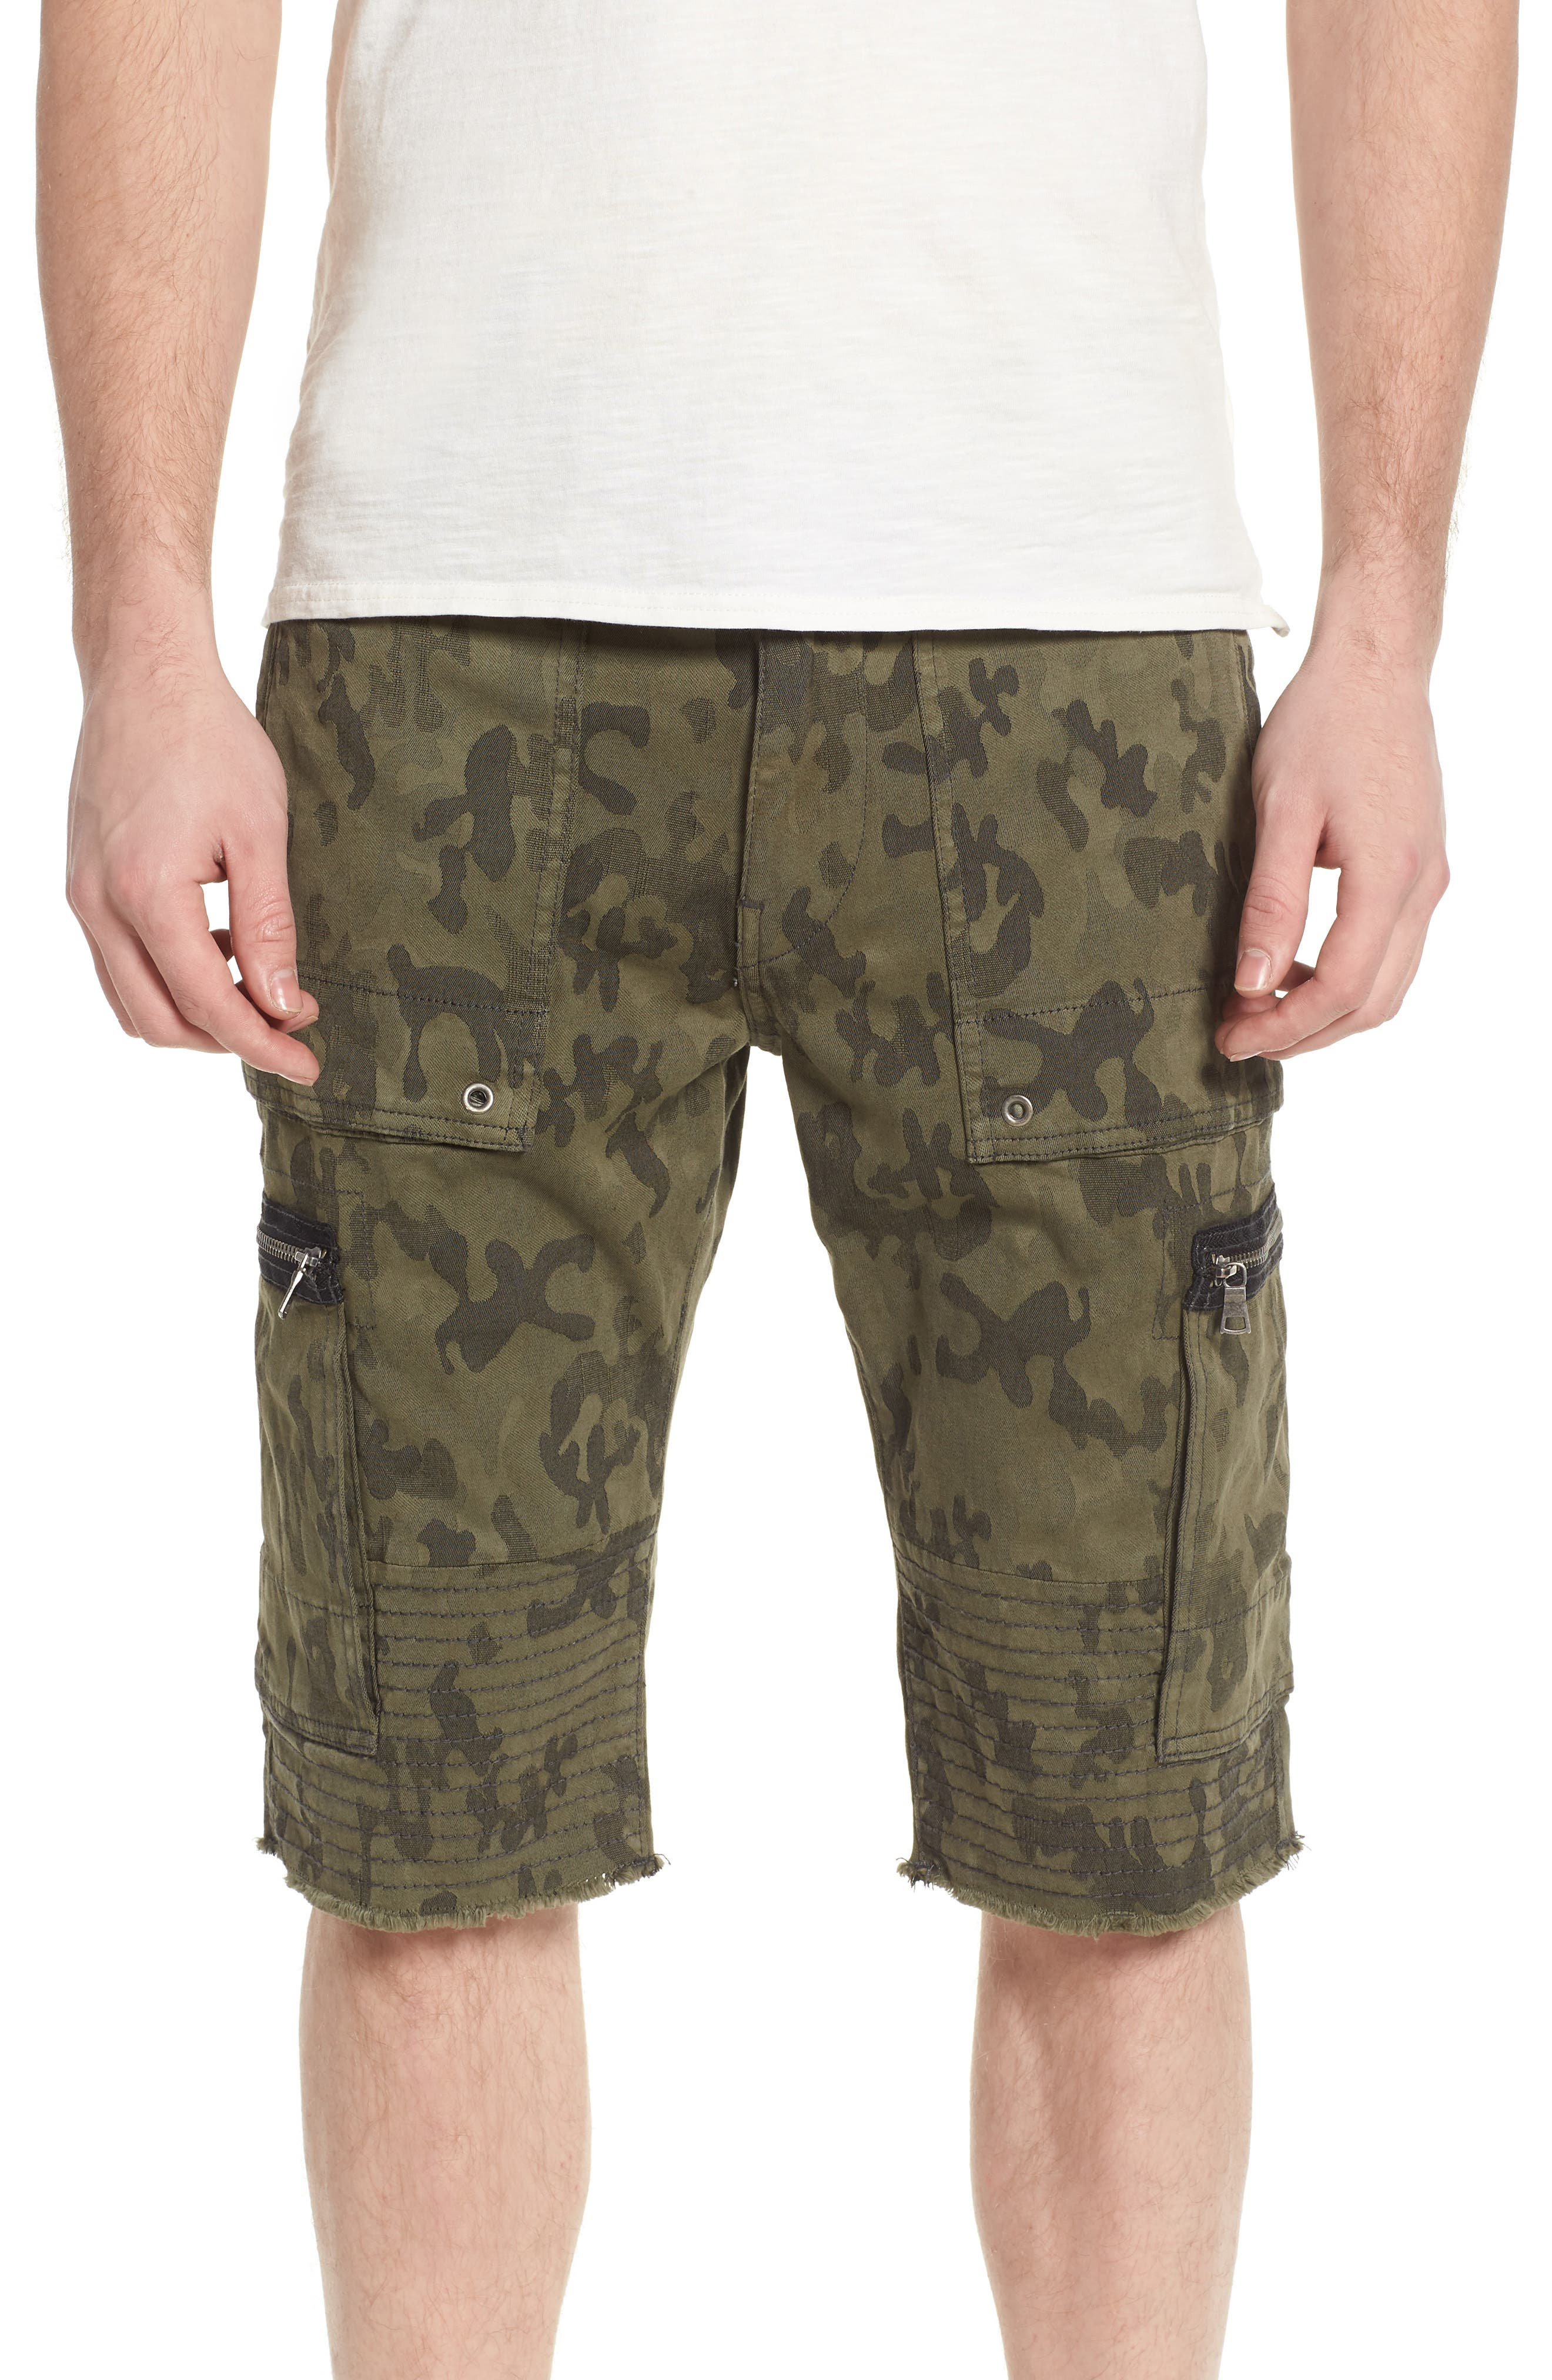 Touring Moto Shorts,                         Main,                         color, Eph Mist Green